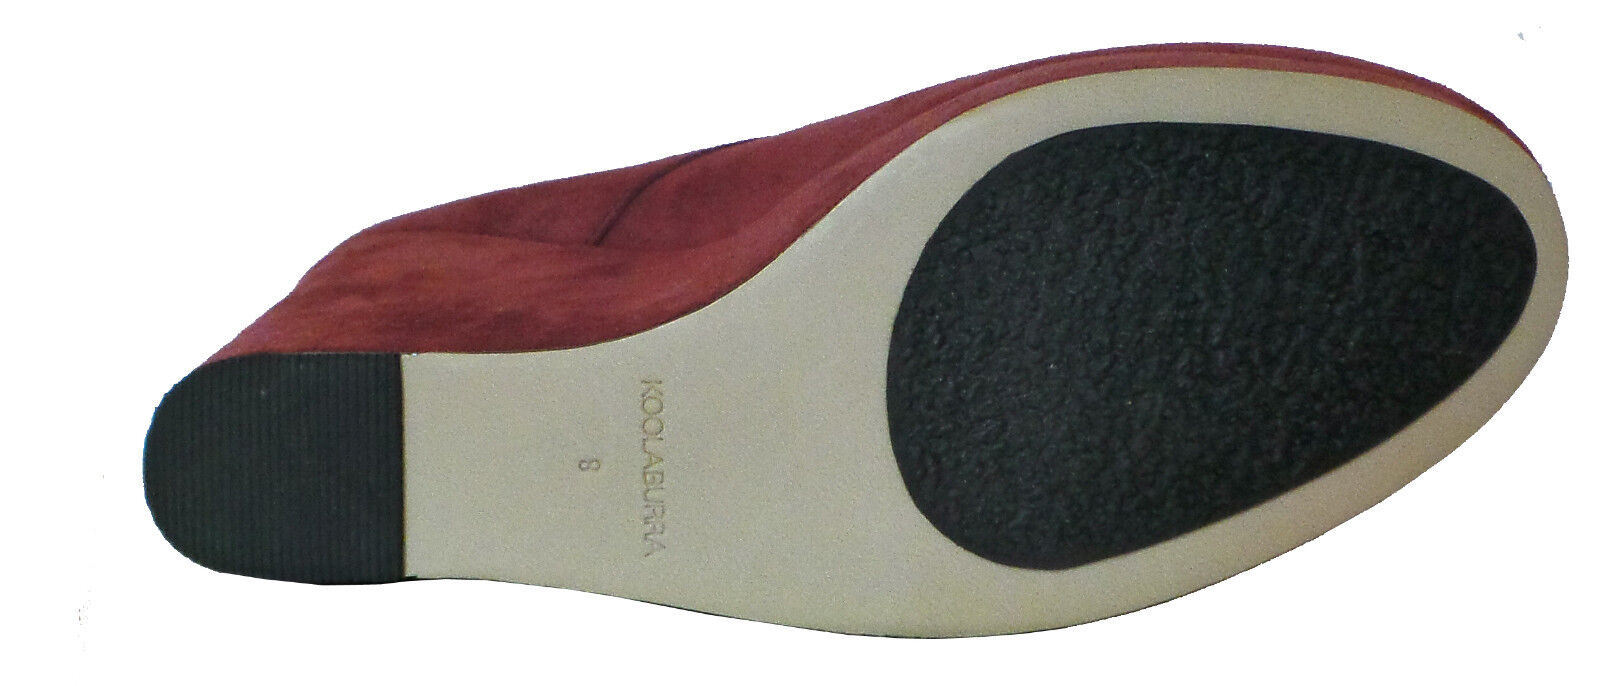 Koolaburra Katelyn 21 [/36 gamuza 39 40 41] de gamuza [/36 botines rojo nuevo fc8192